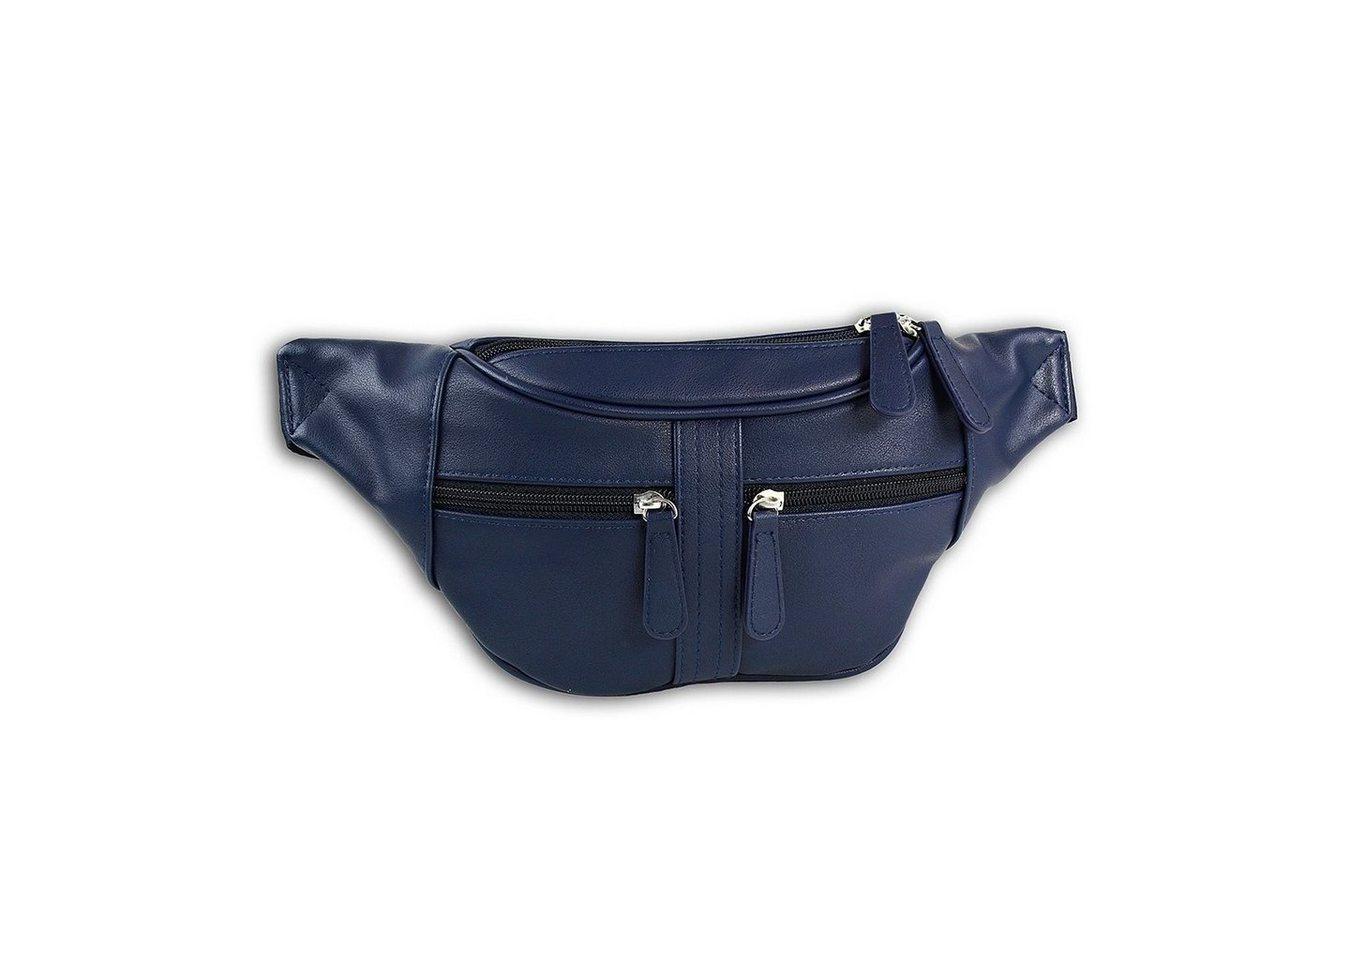 new bags -  Gürteltasche »OTD5023X  Damen Hüfttasche Gürteltasche« (Gürteltasche), Damen, Jugend Tasche navy, ca. 35cm x ca. 5cm